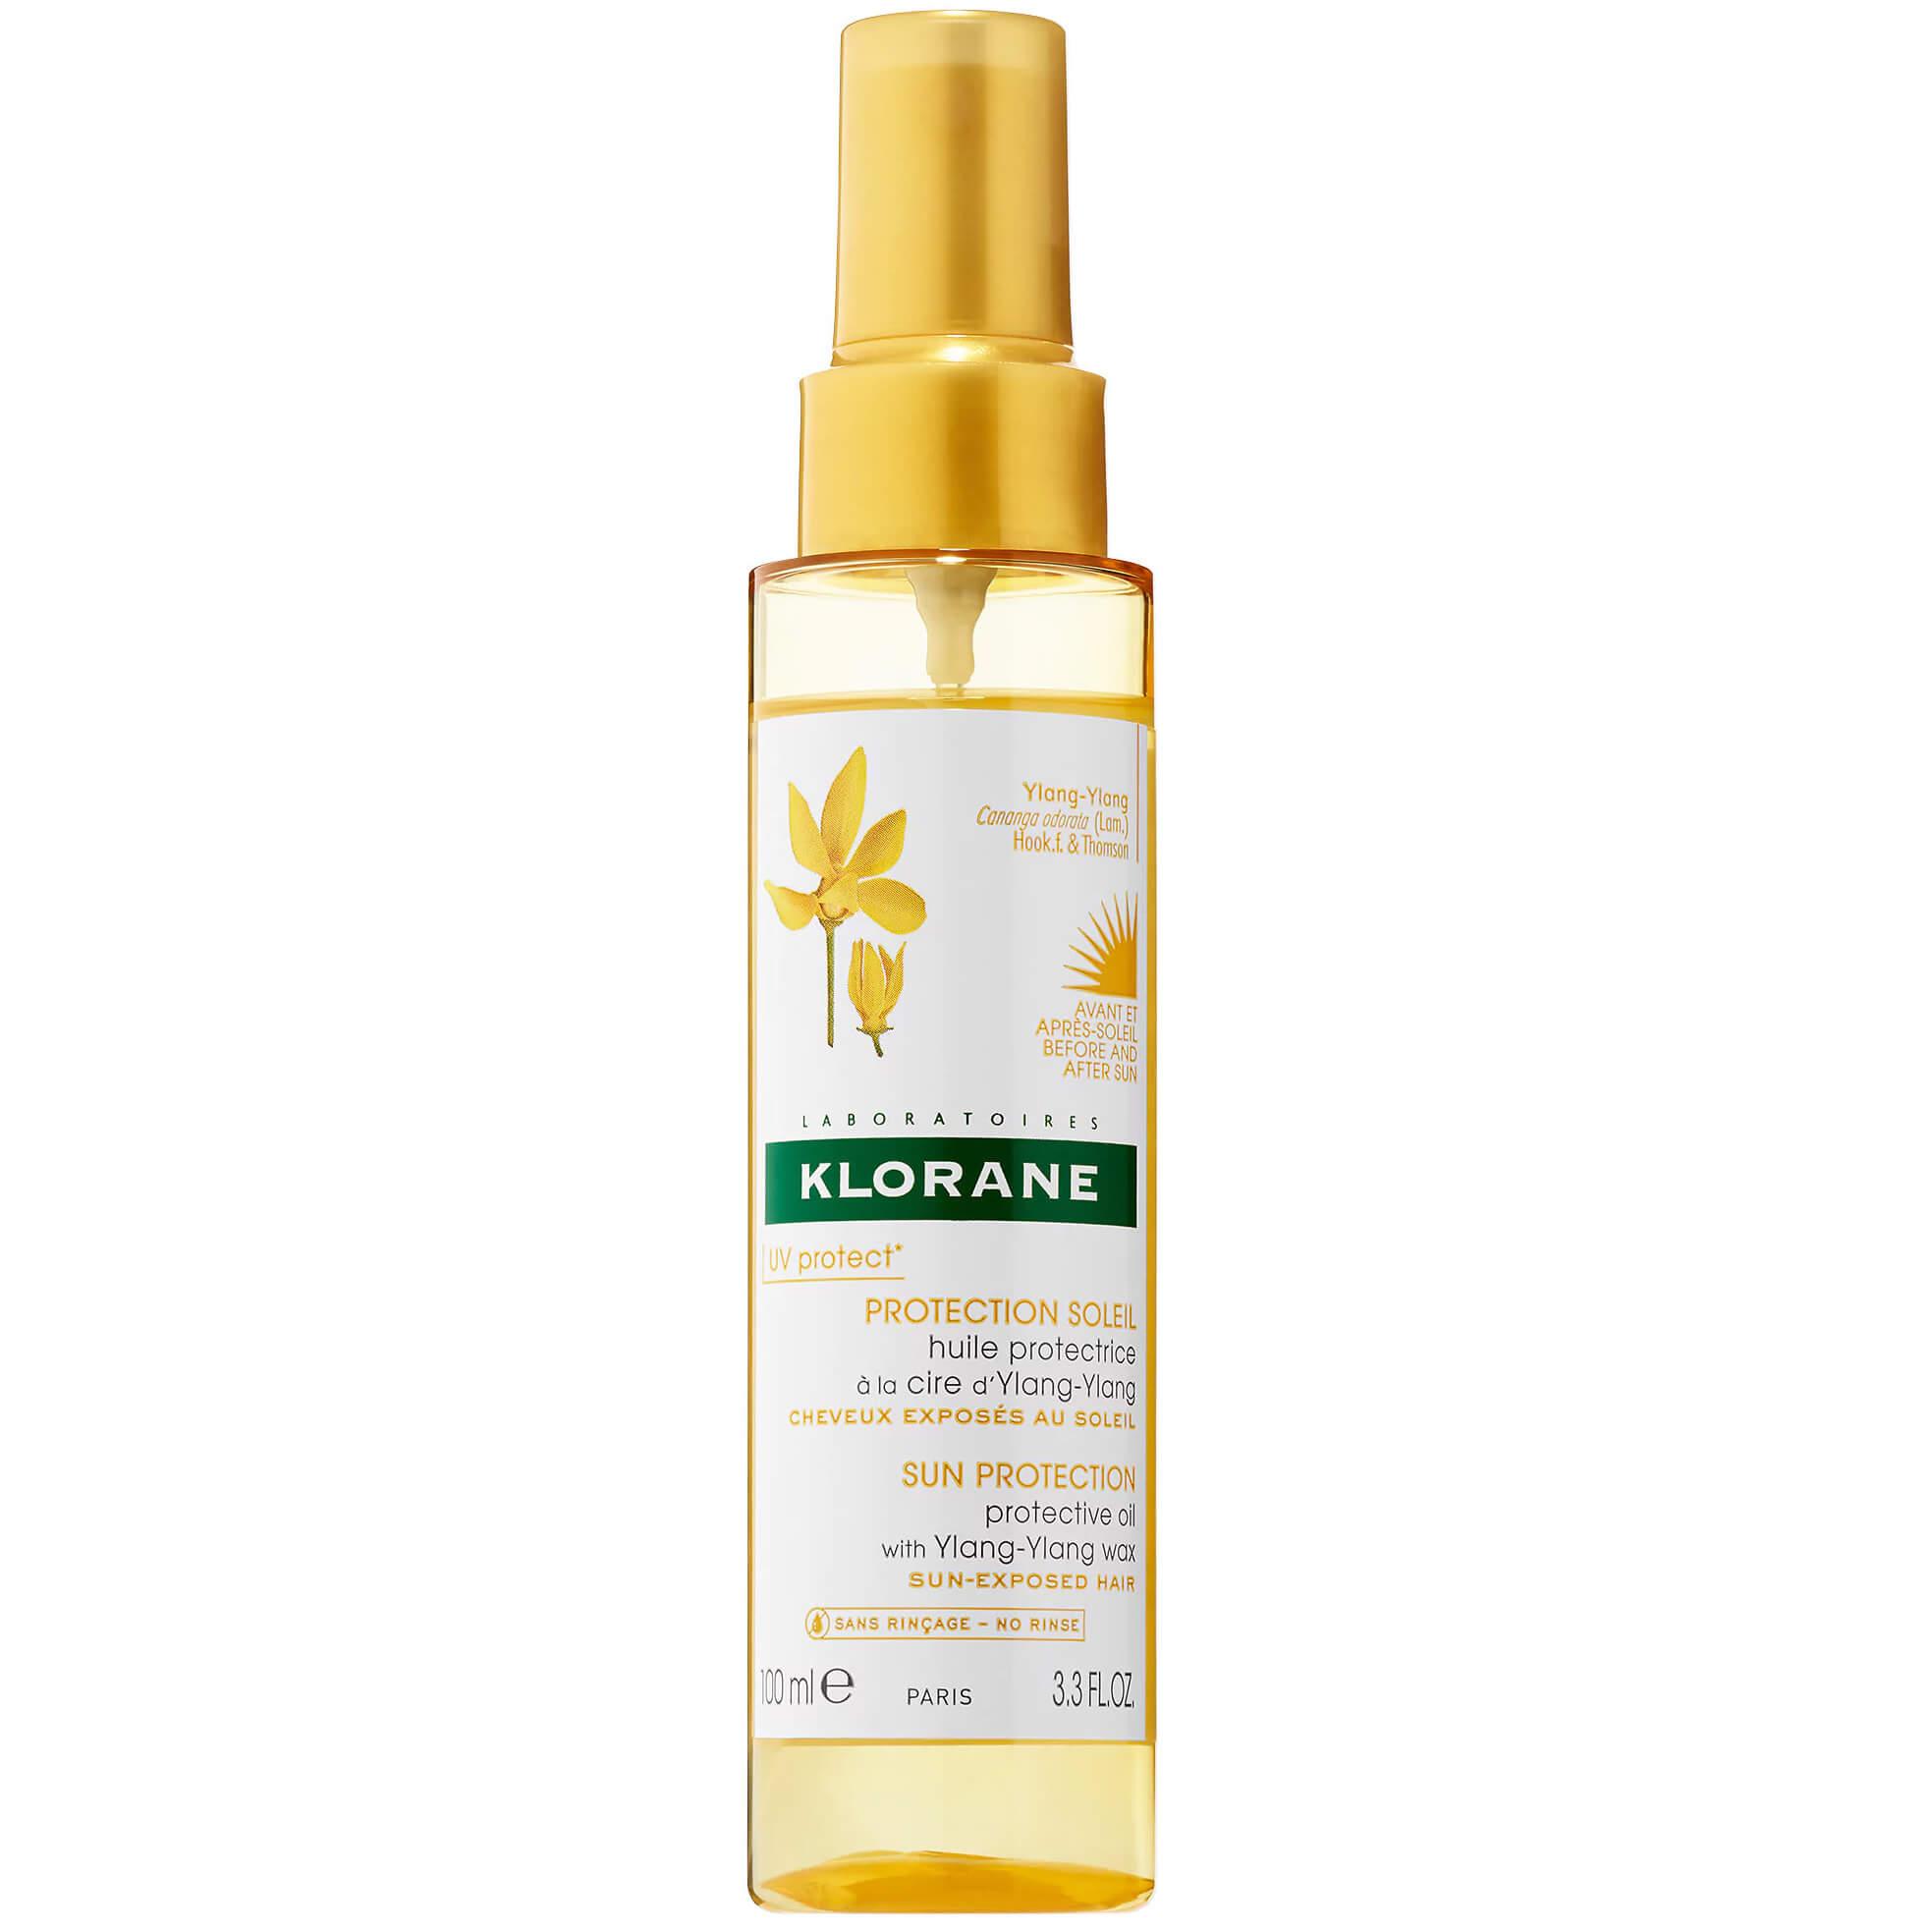 Klorane Huile Soin Soleil Ylang Ylang Αντηλιακό Λάδι σε Spray για Προστασία των Μαλλιών από την Έκθεση στον Ήλιο 100ml